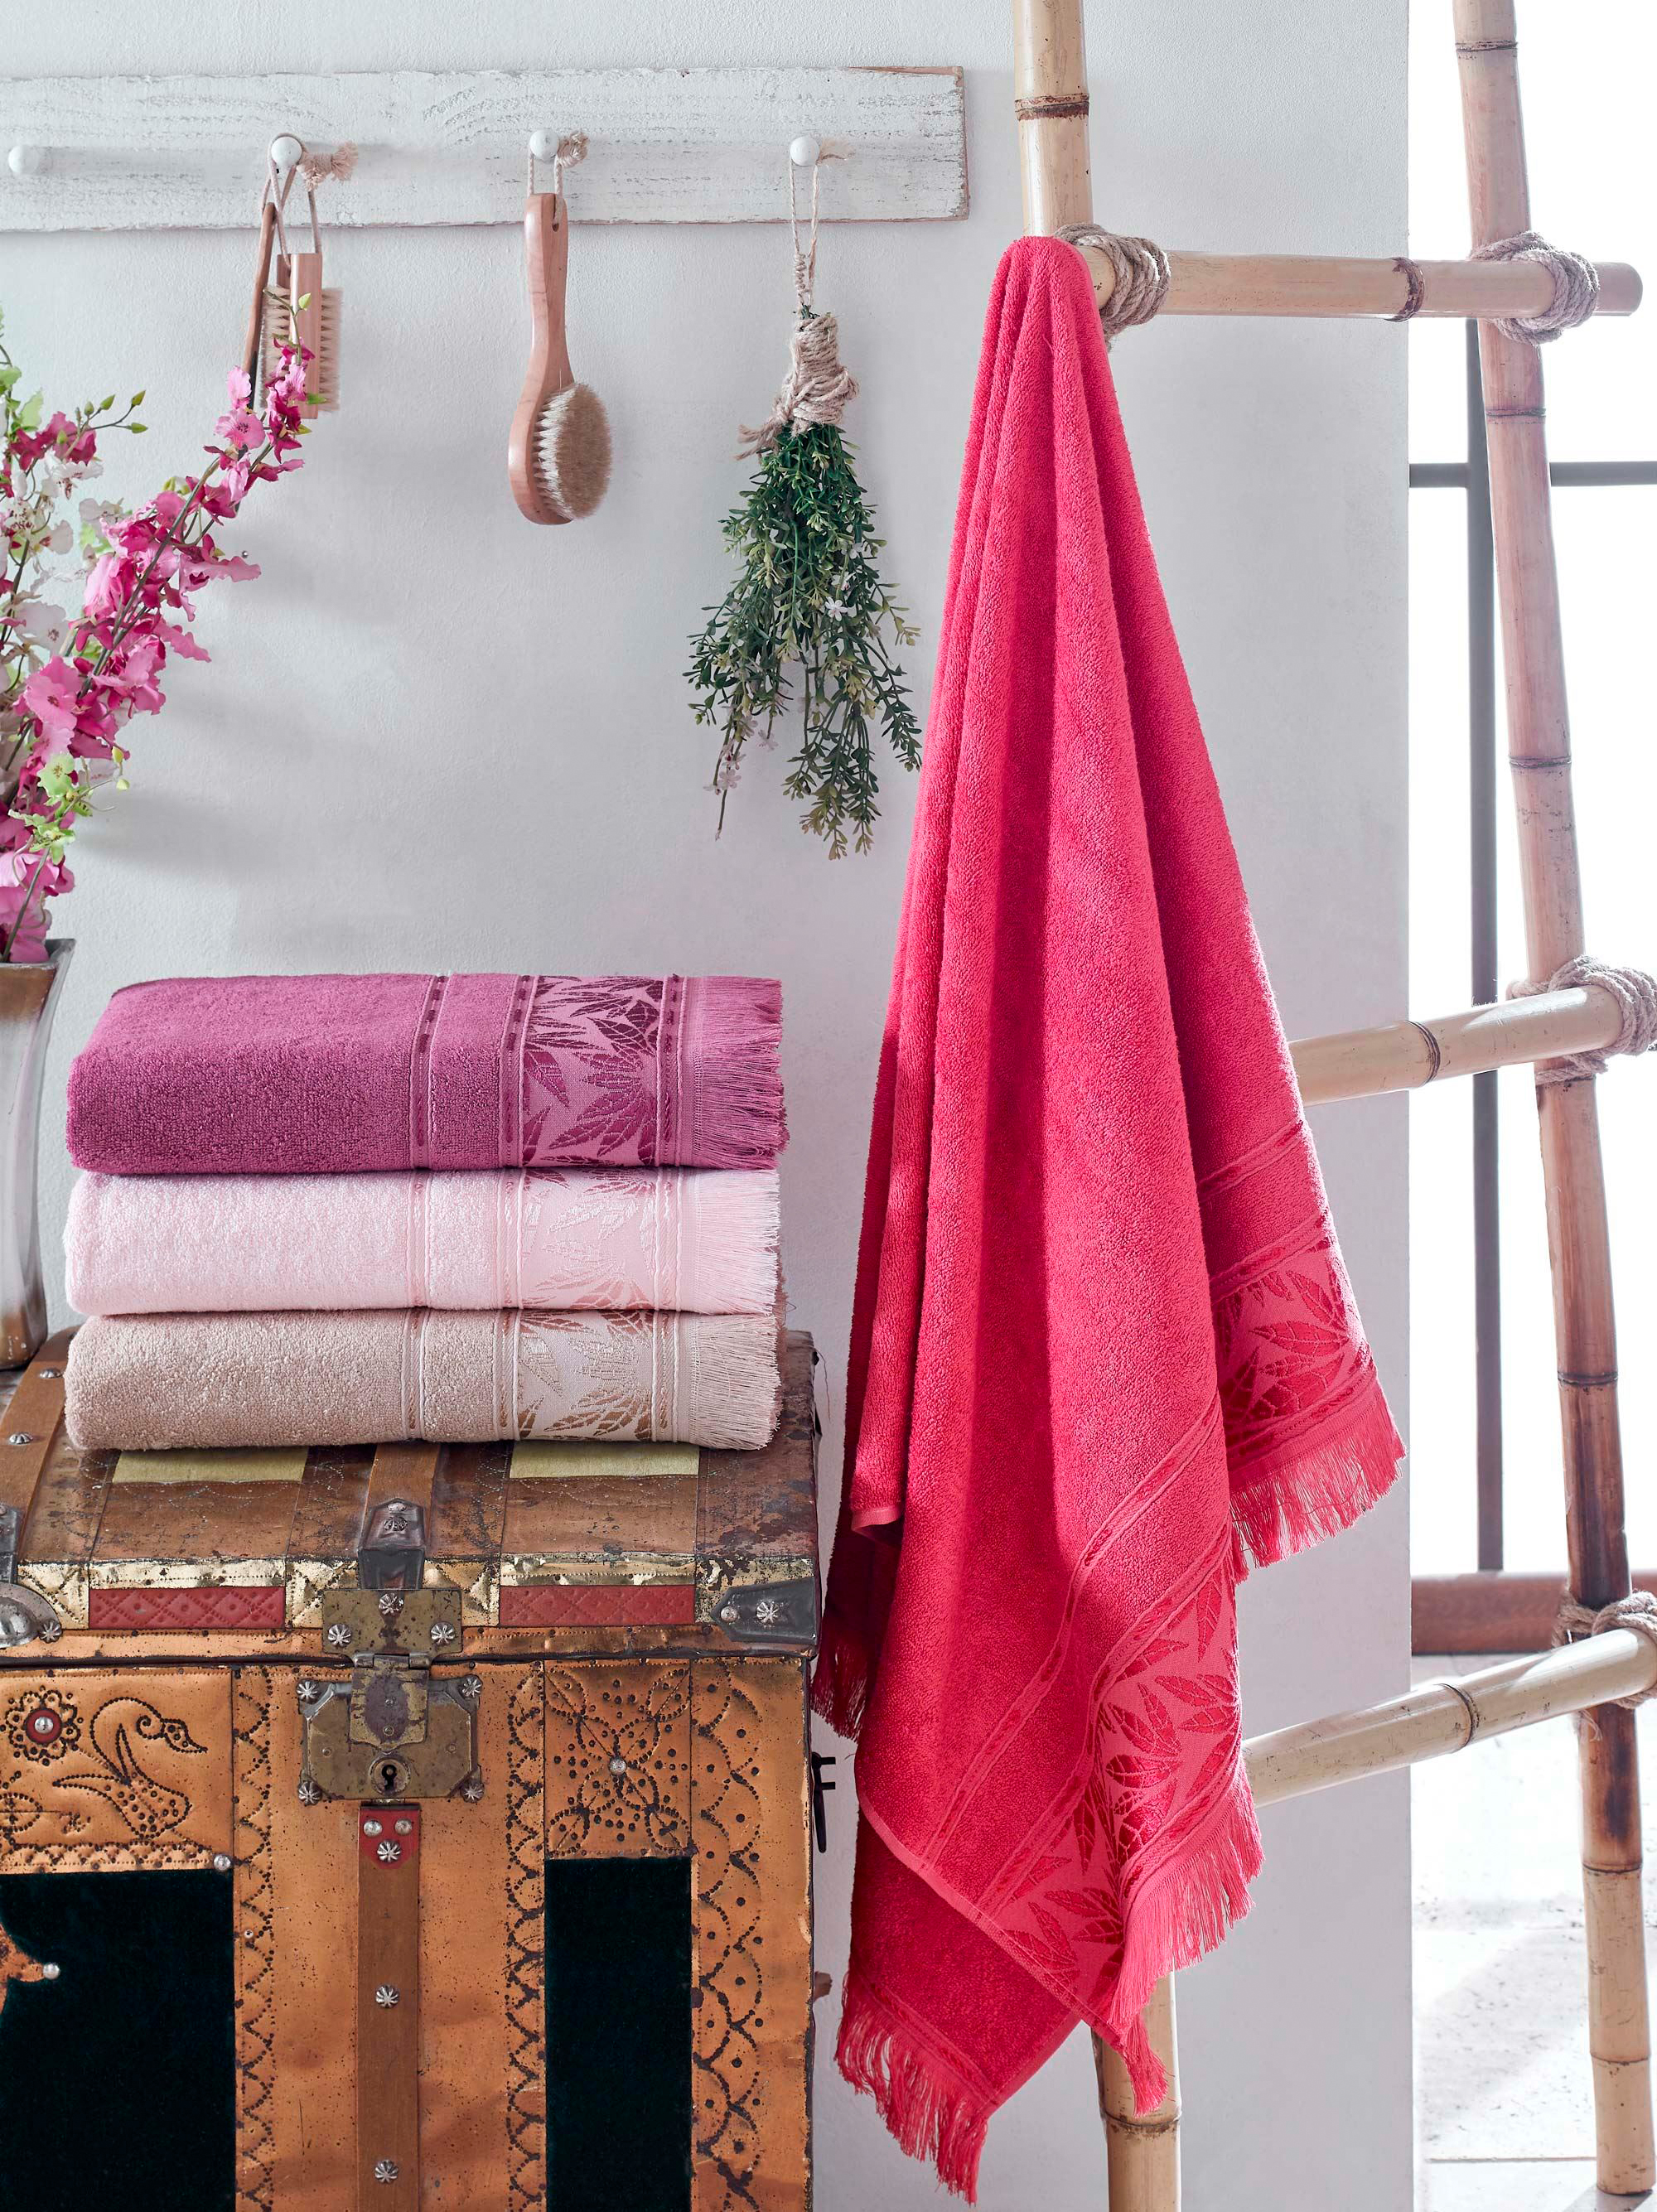 Купить Полотенца DO'n'CO, Полотенце Emily (50х90 см - 4 шт), Турция, Бордовый, Розовый, Бамбук